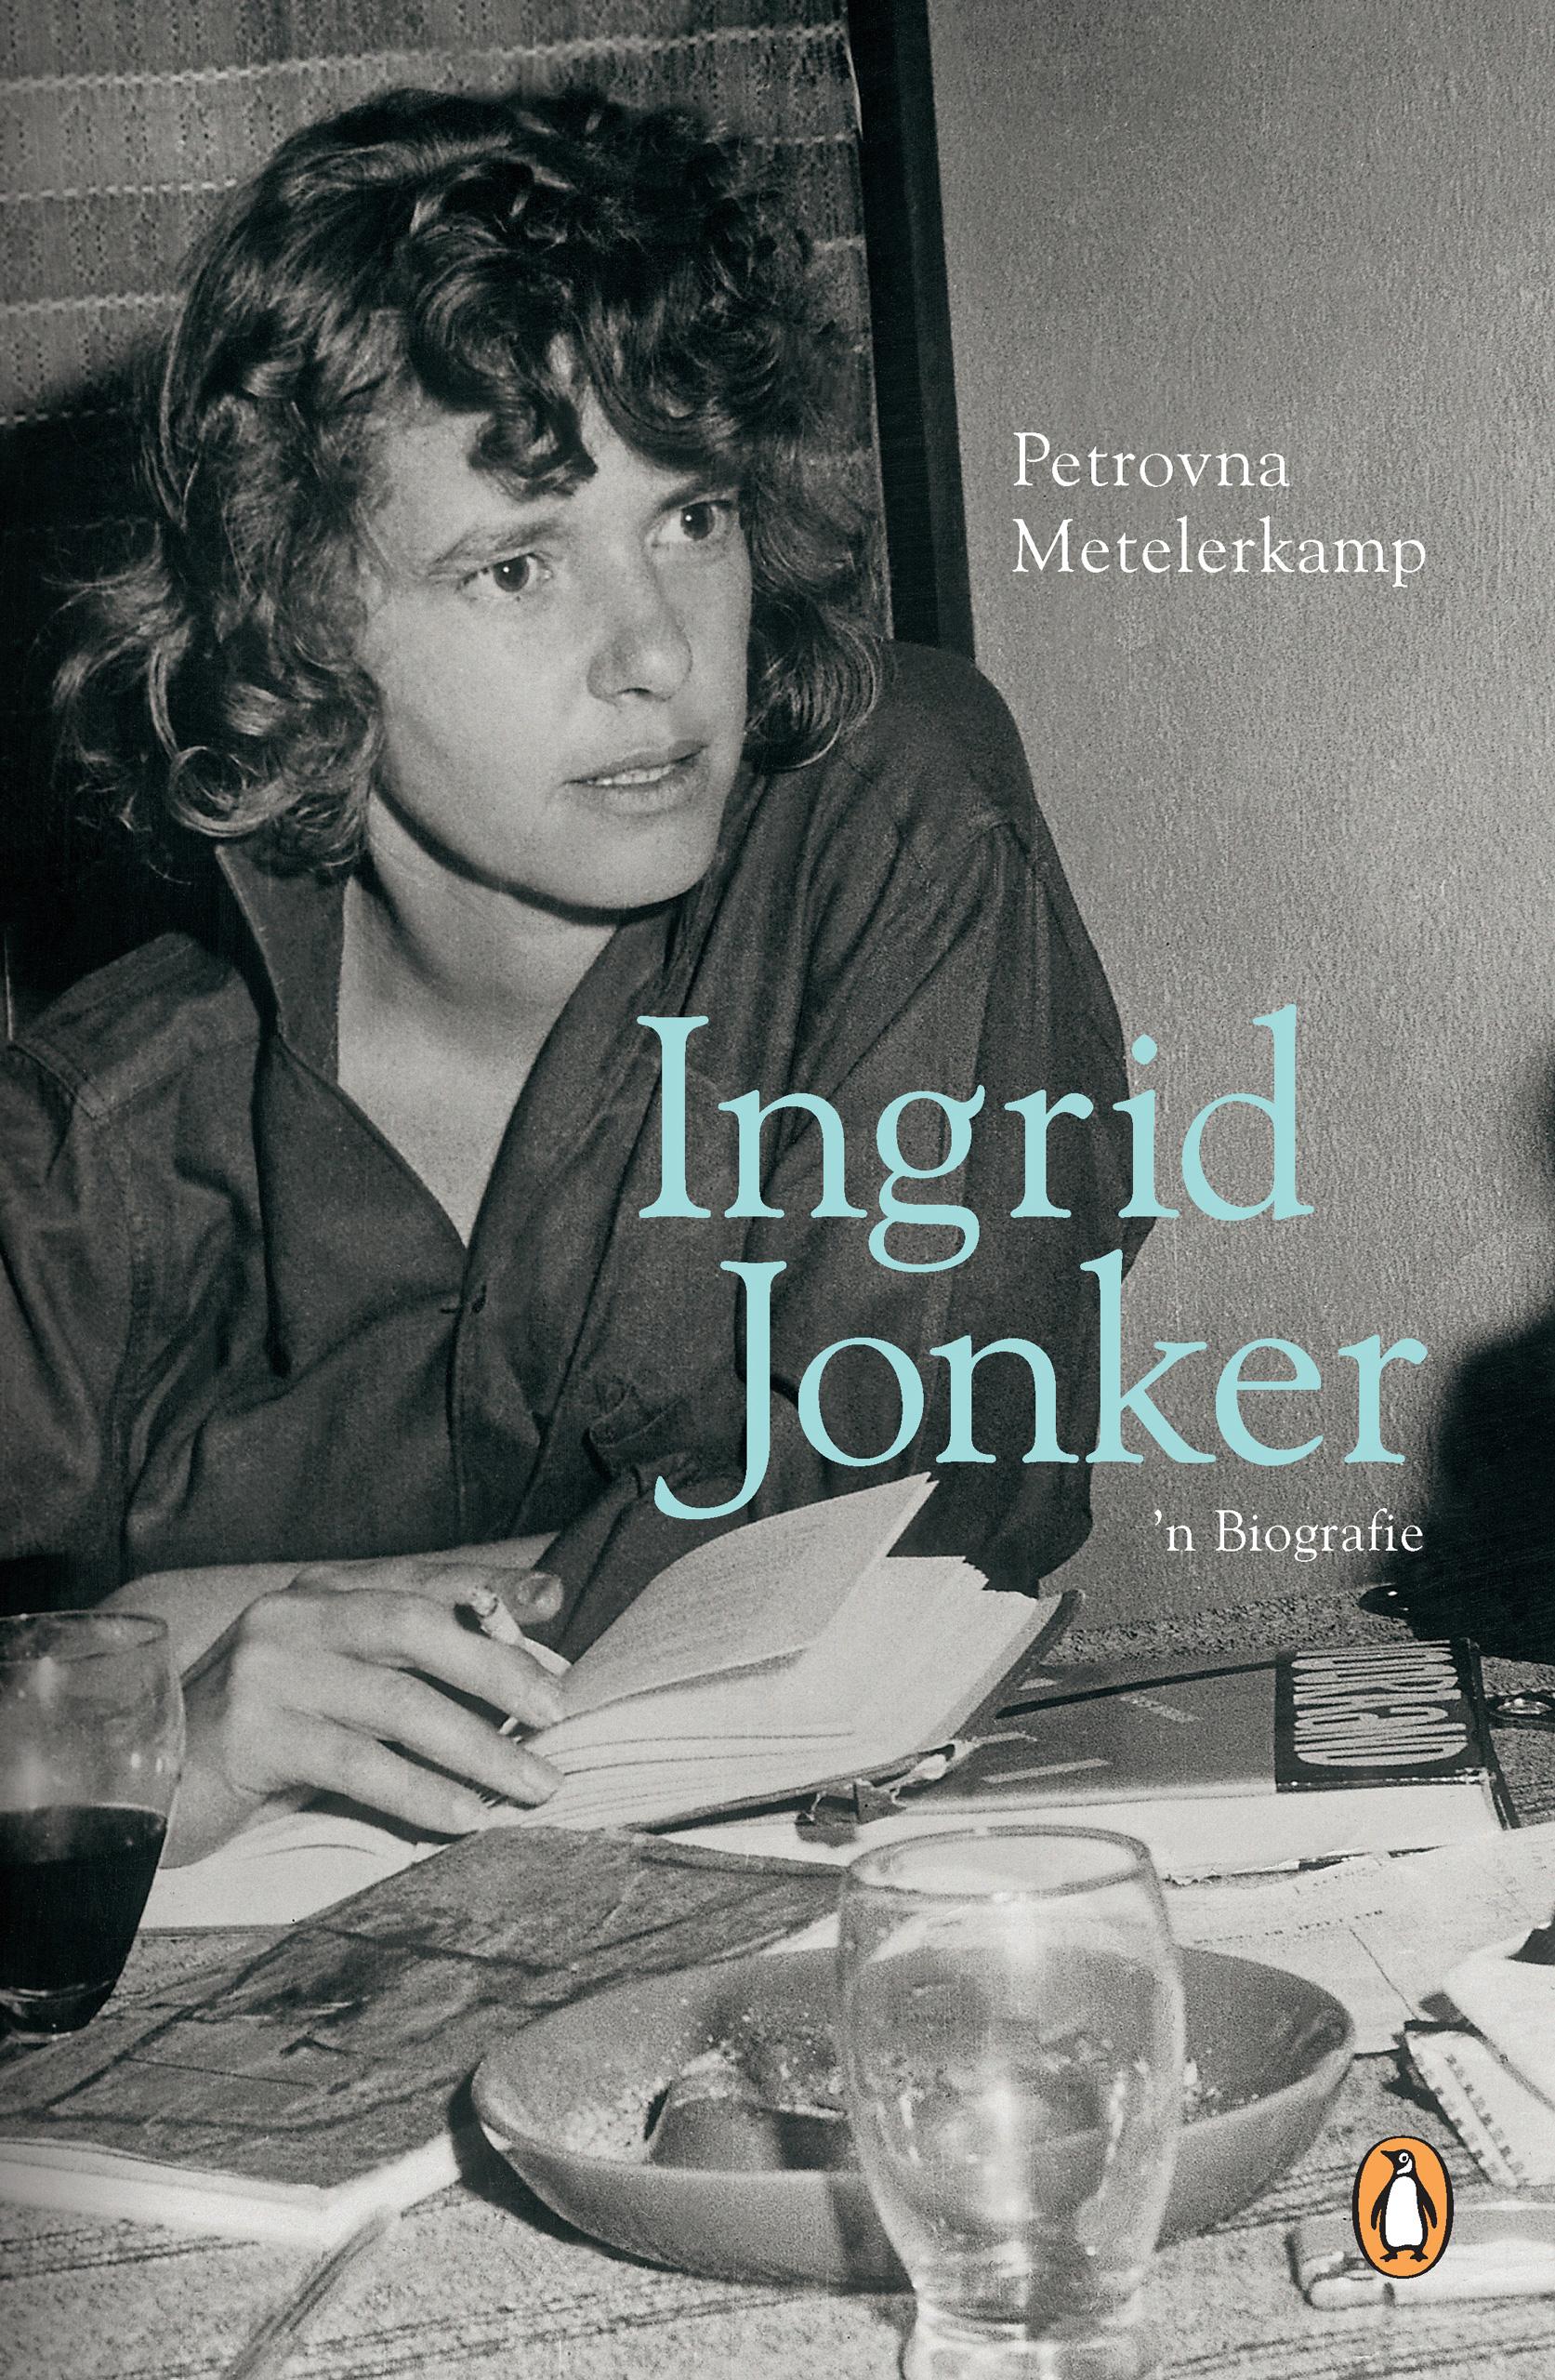 Picture of Ingrid Jonker